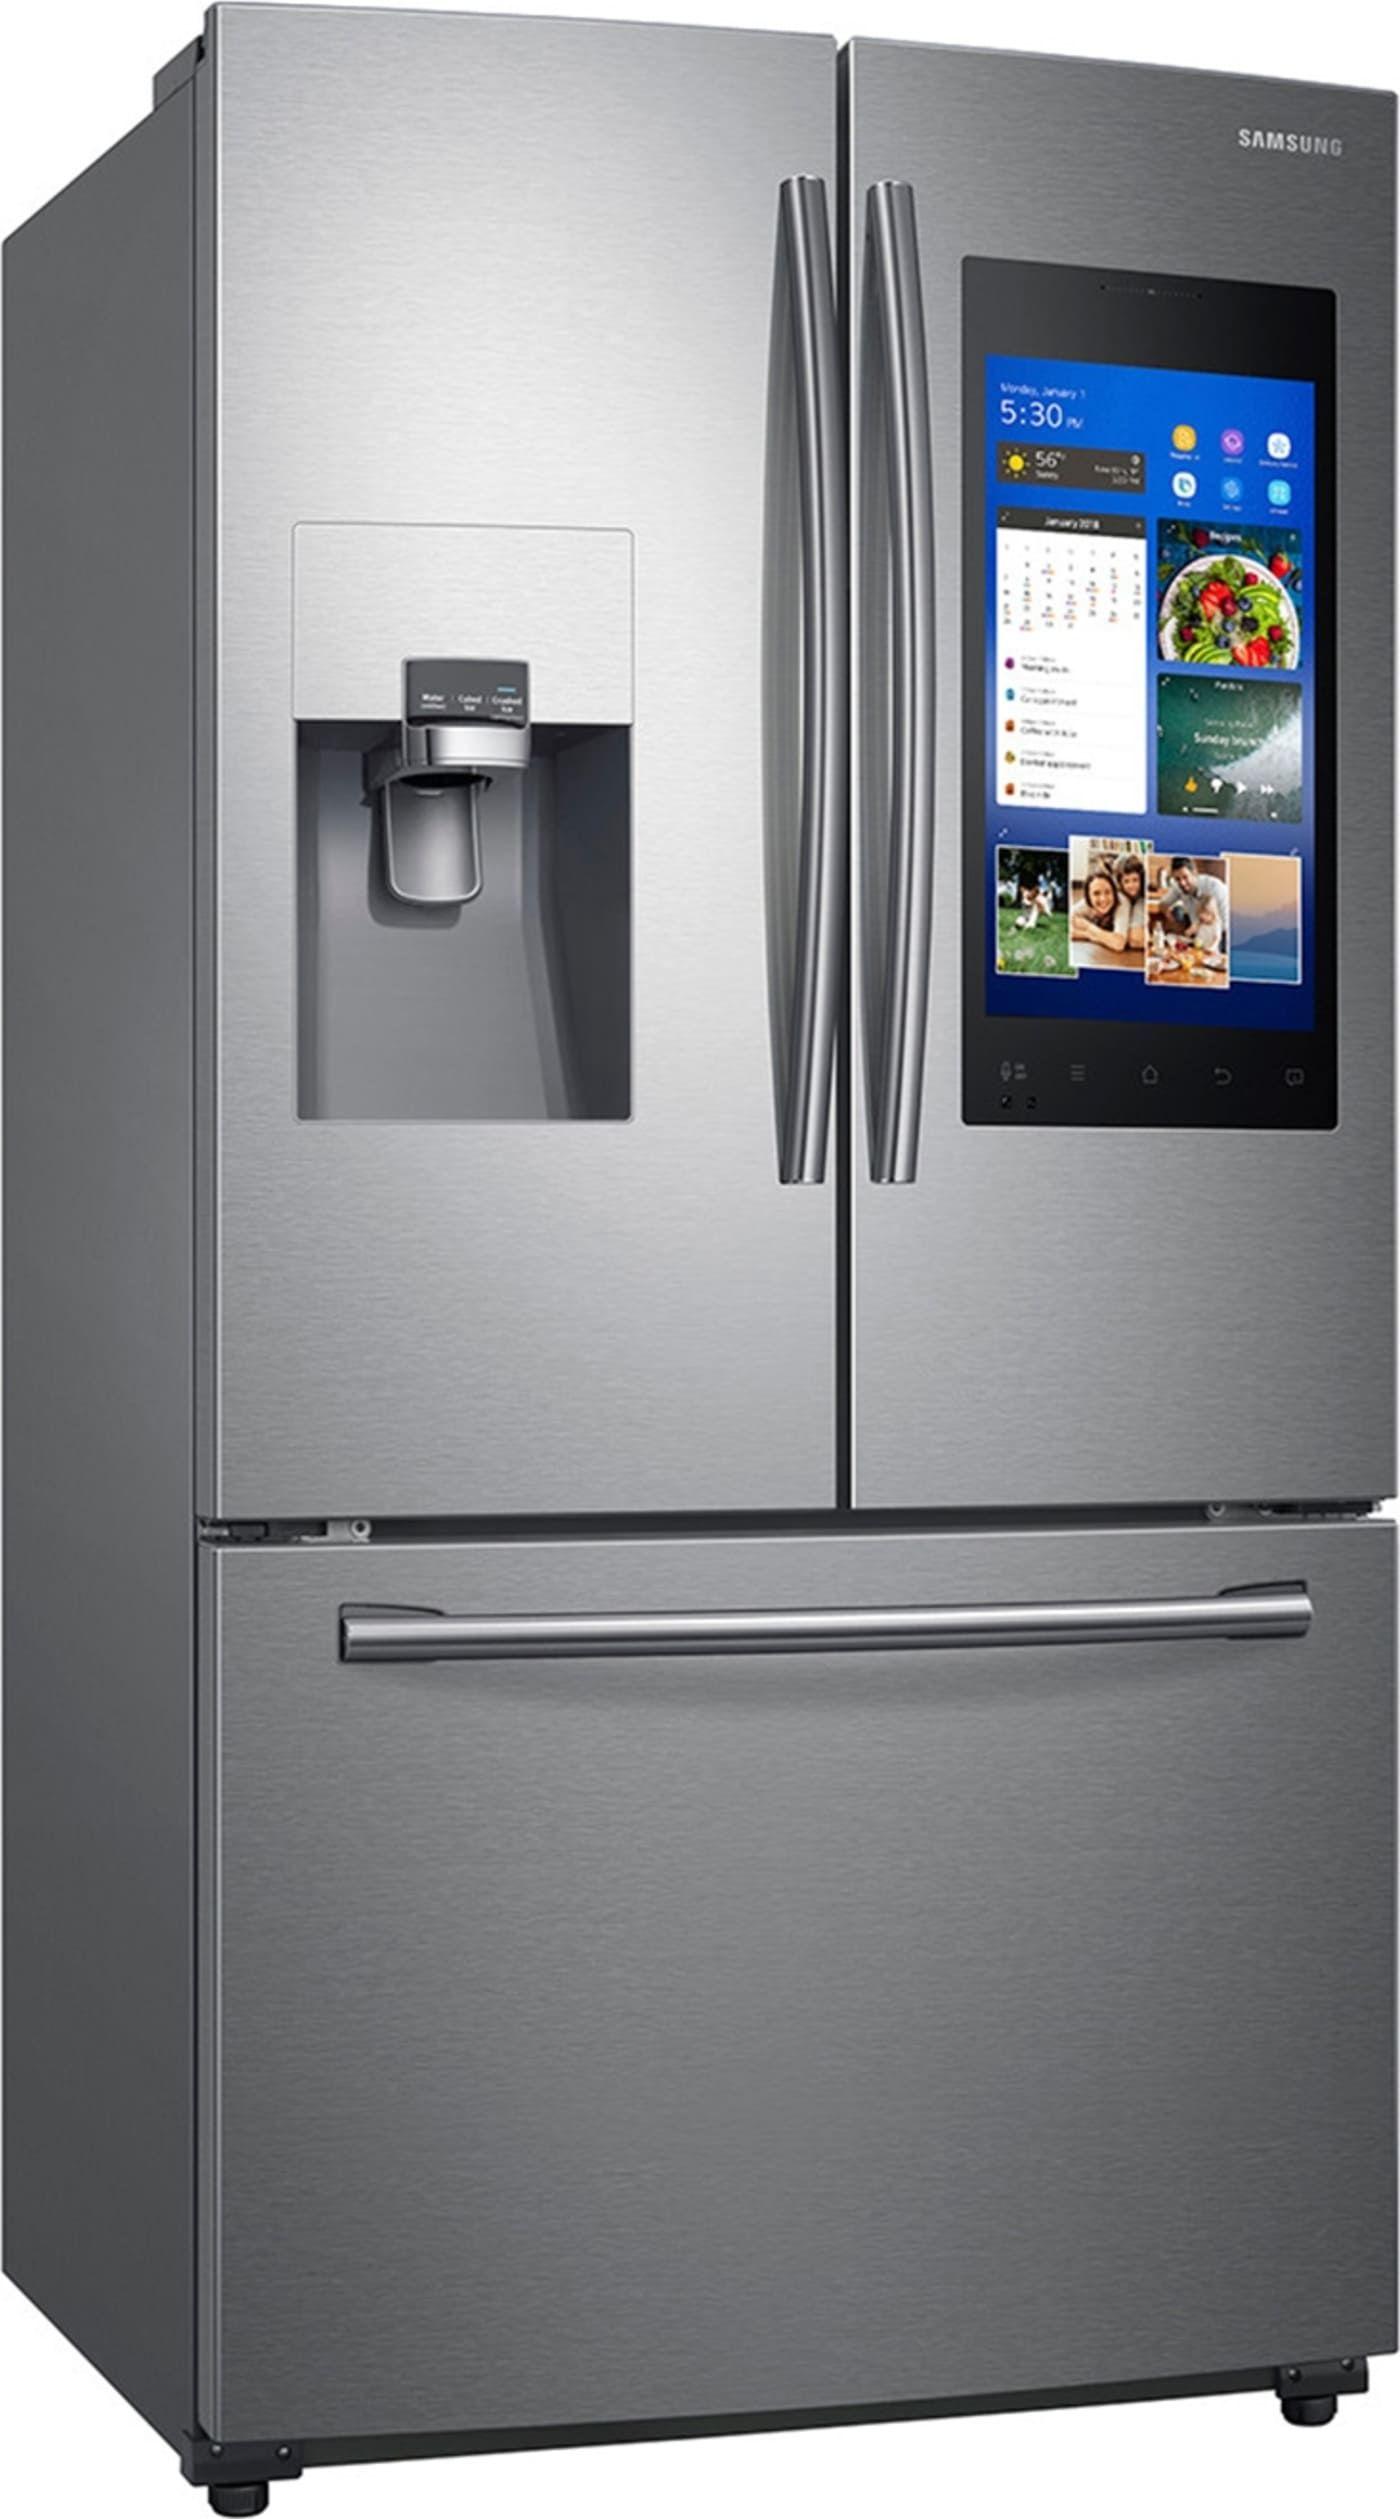 Samsung Rf265beaesr French Door Refrigerator Samsung Family Hub Stainless Steel Refrigerator